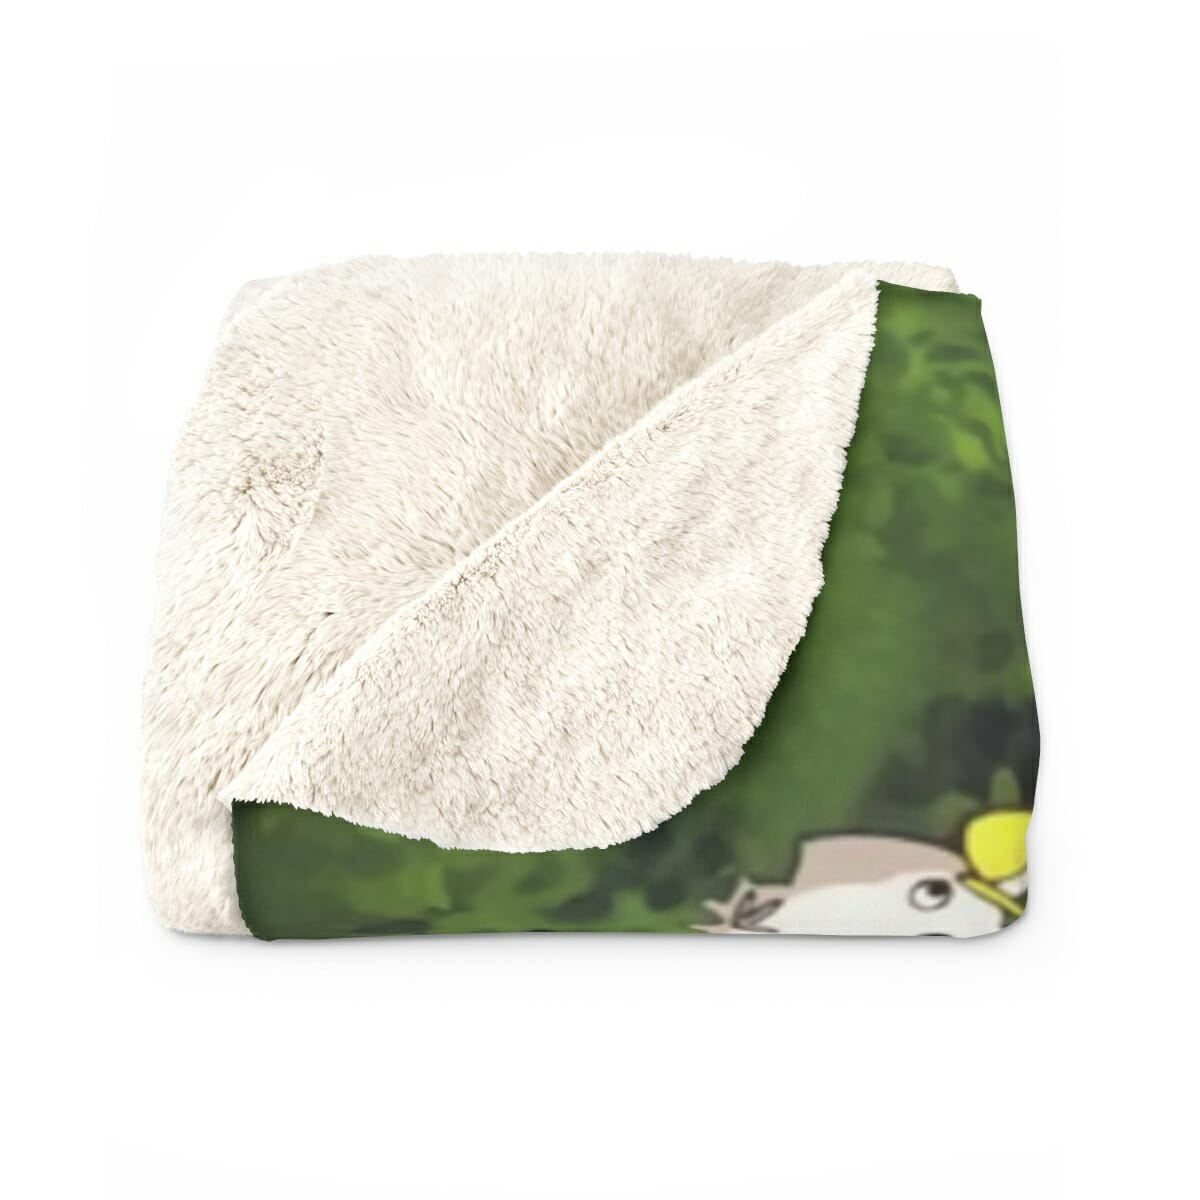 My Neighbor Totoro – The Nap Blanket